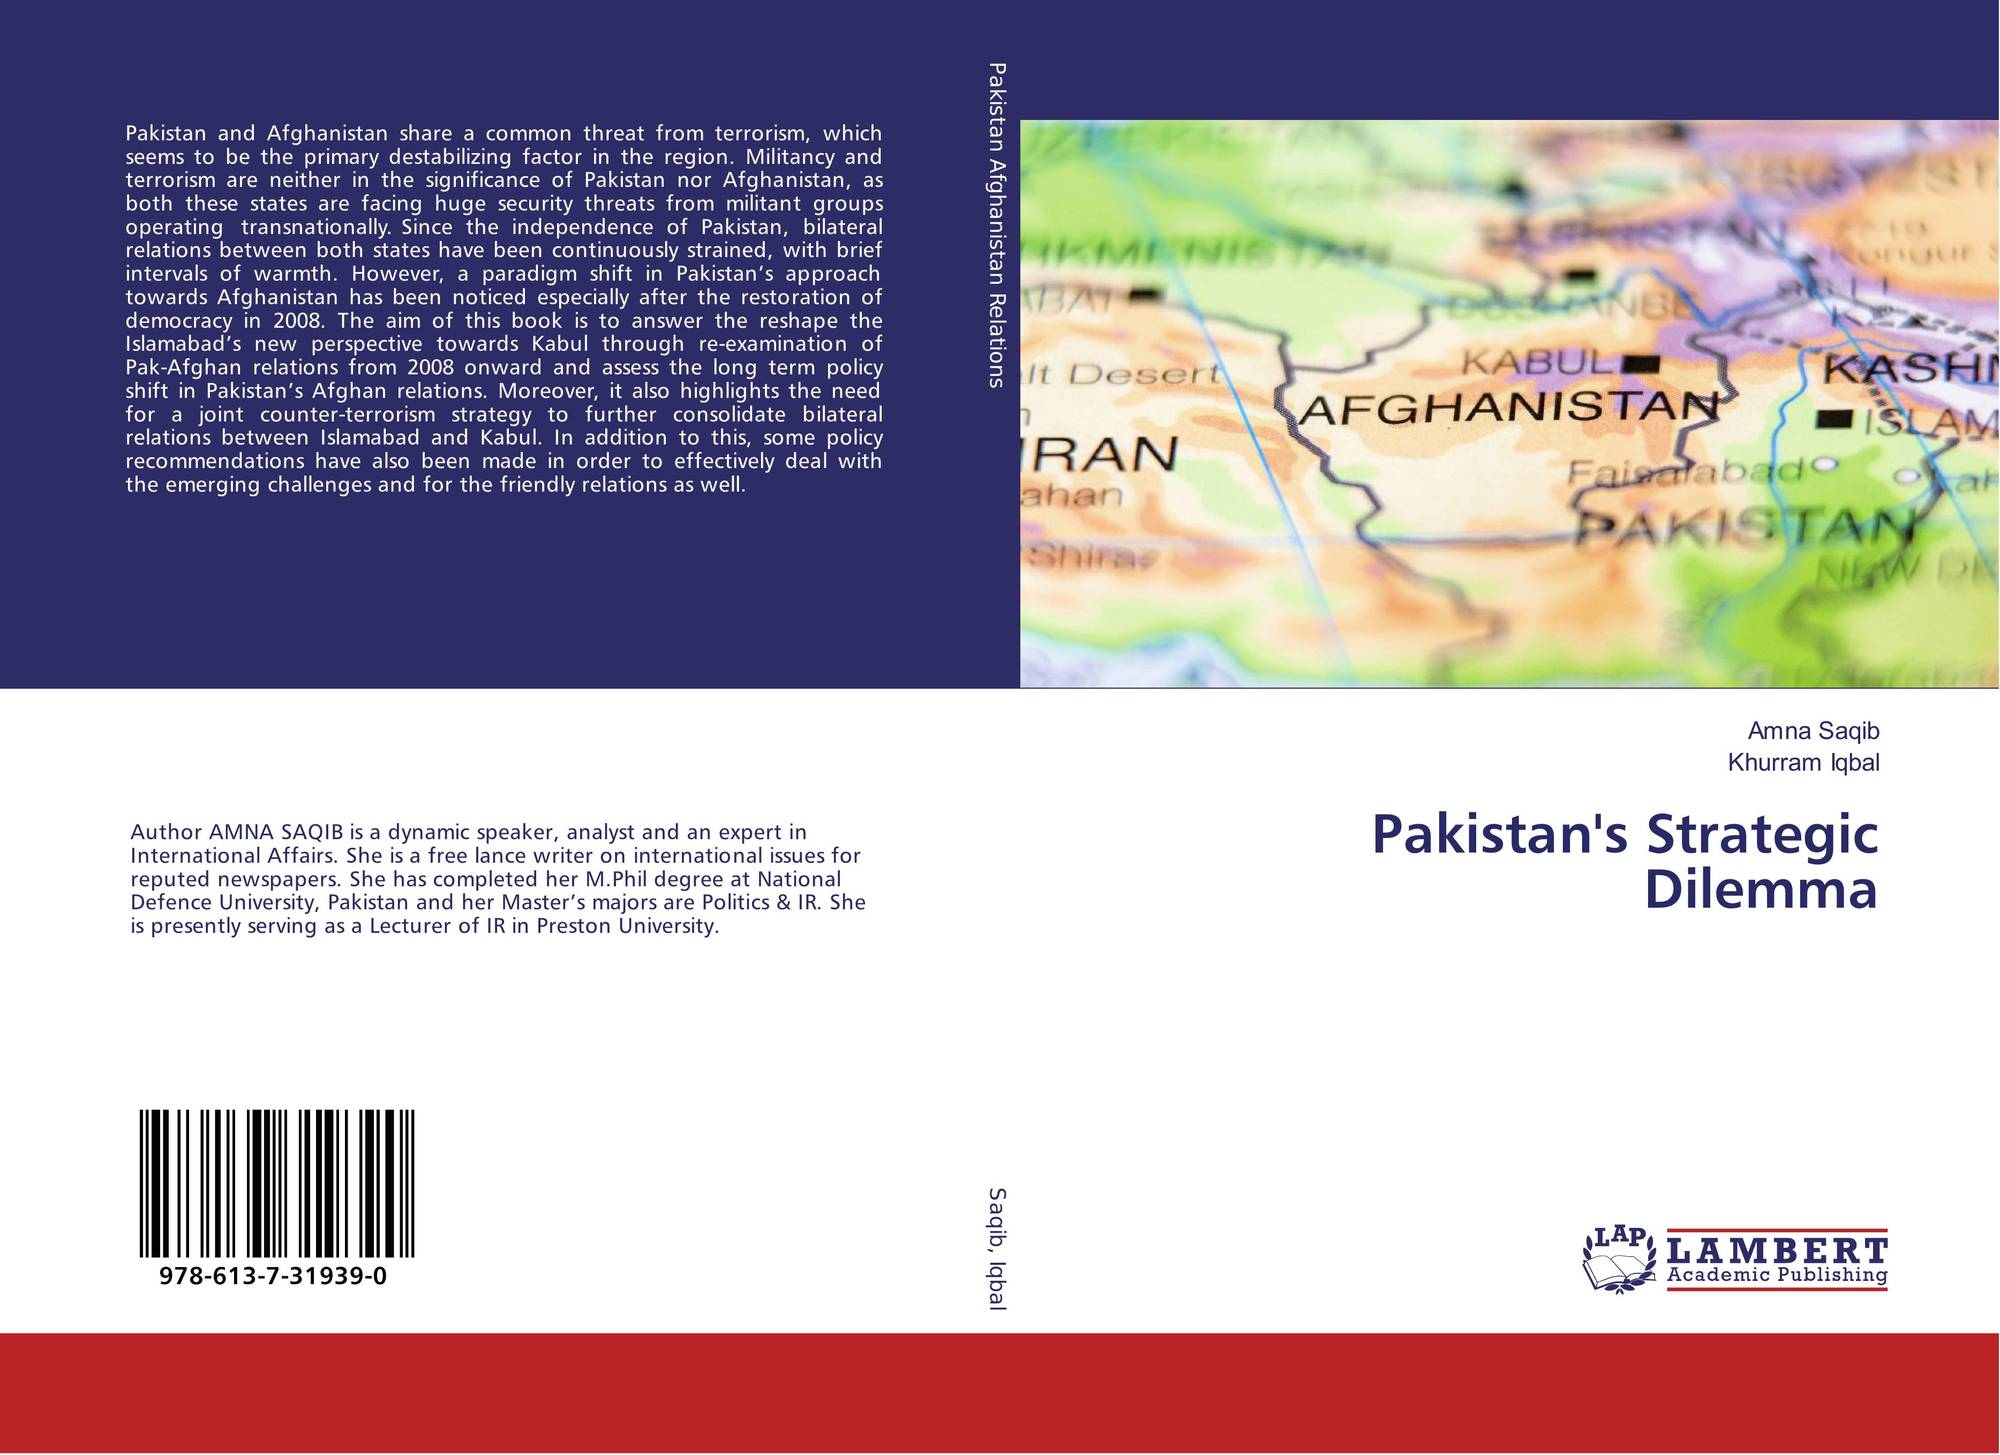 Pakistan's Strategic Dilemma, 978-613-7-31939-0, 6137319393